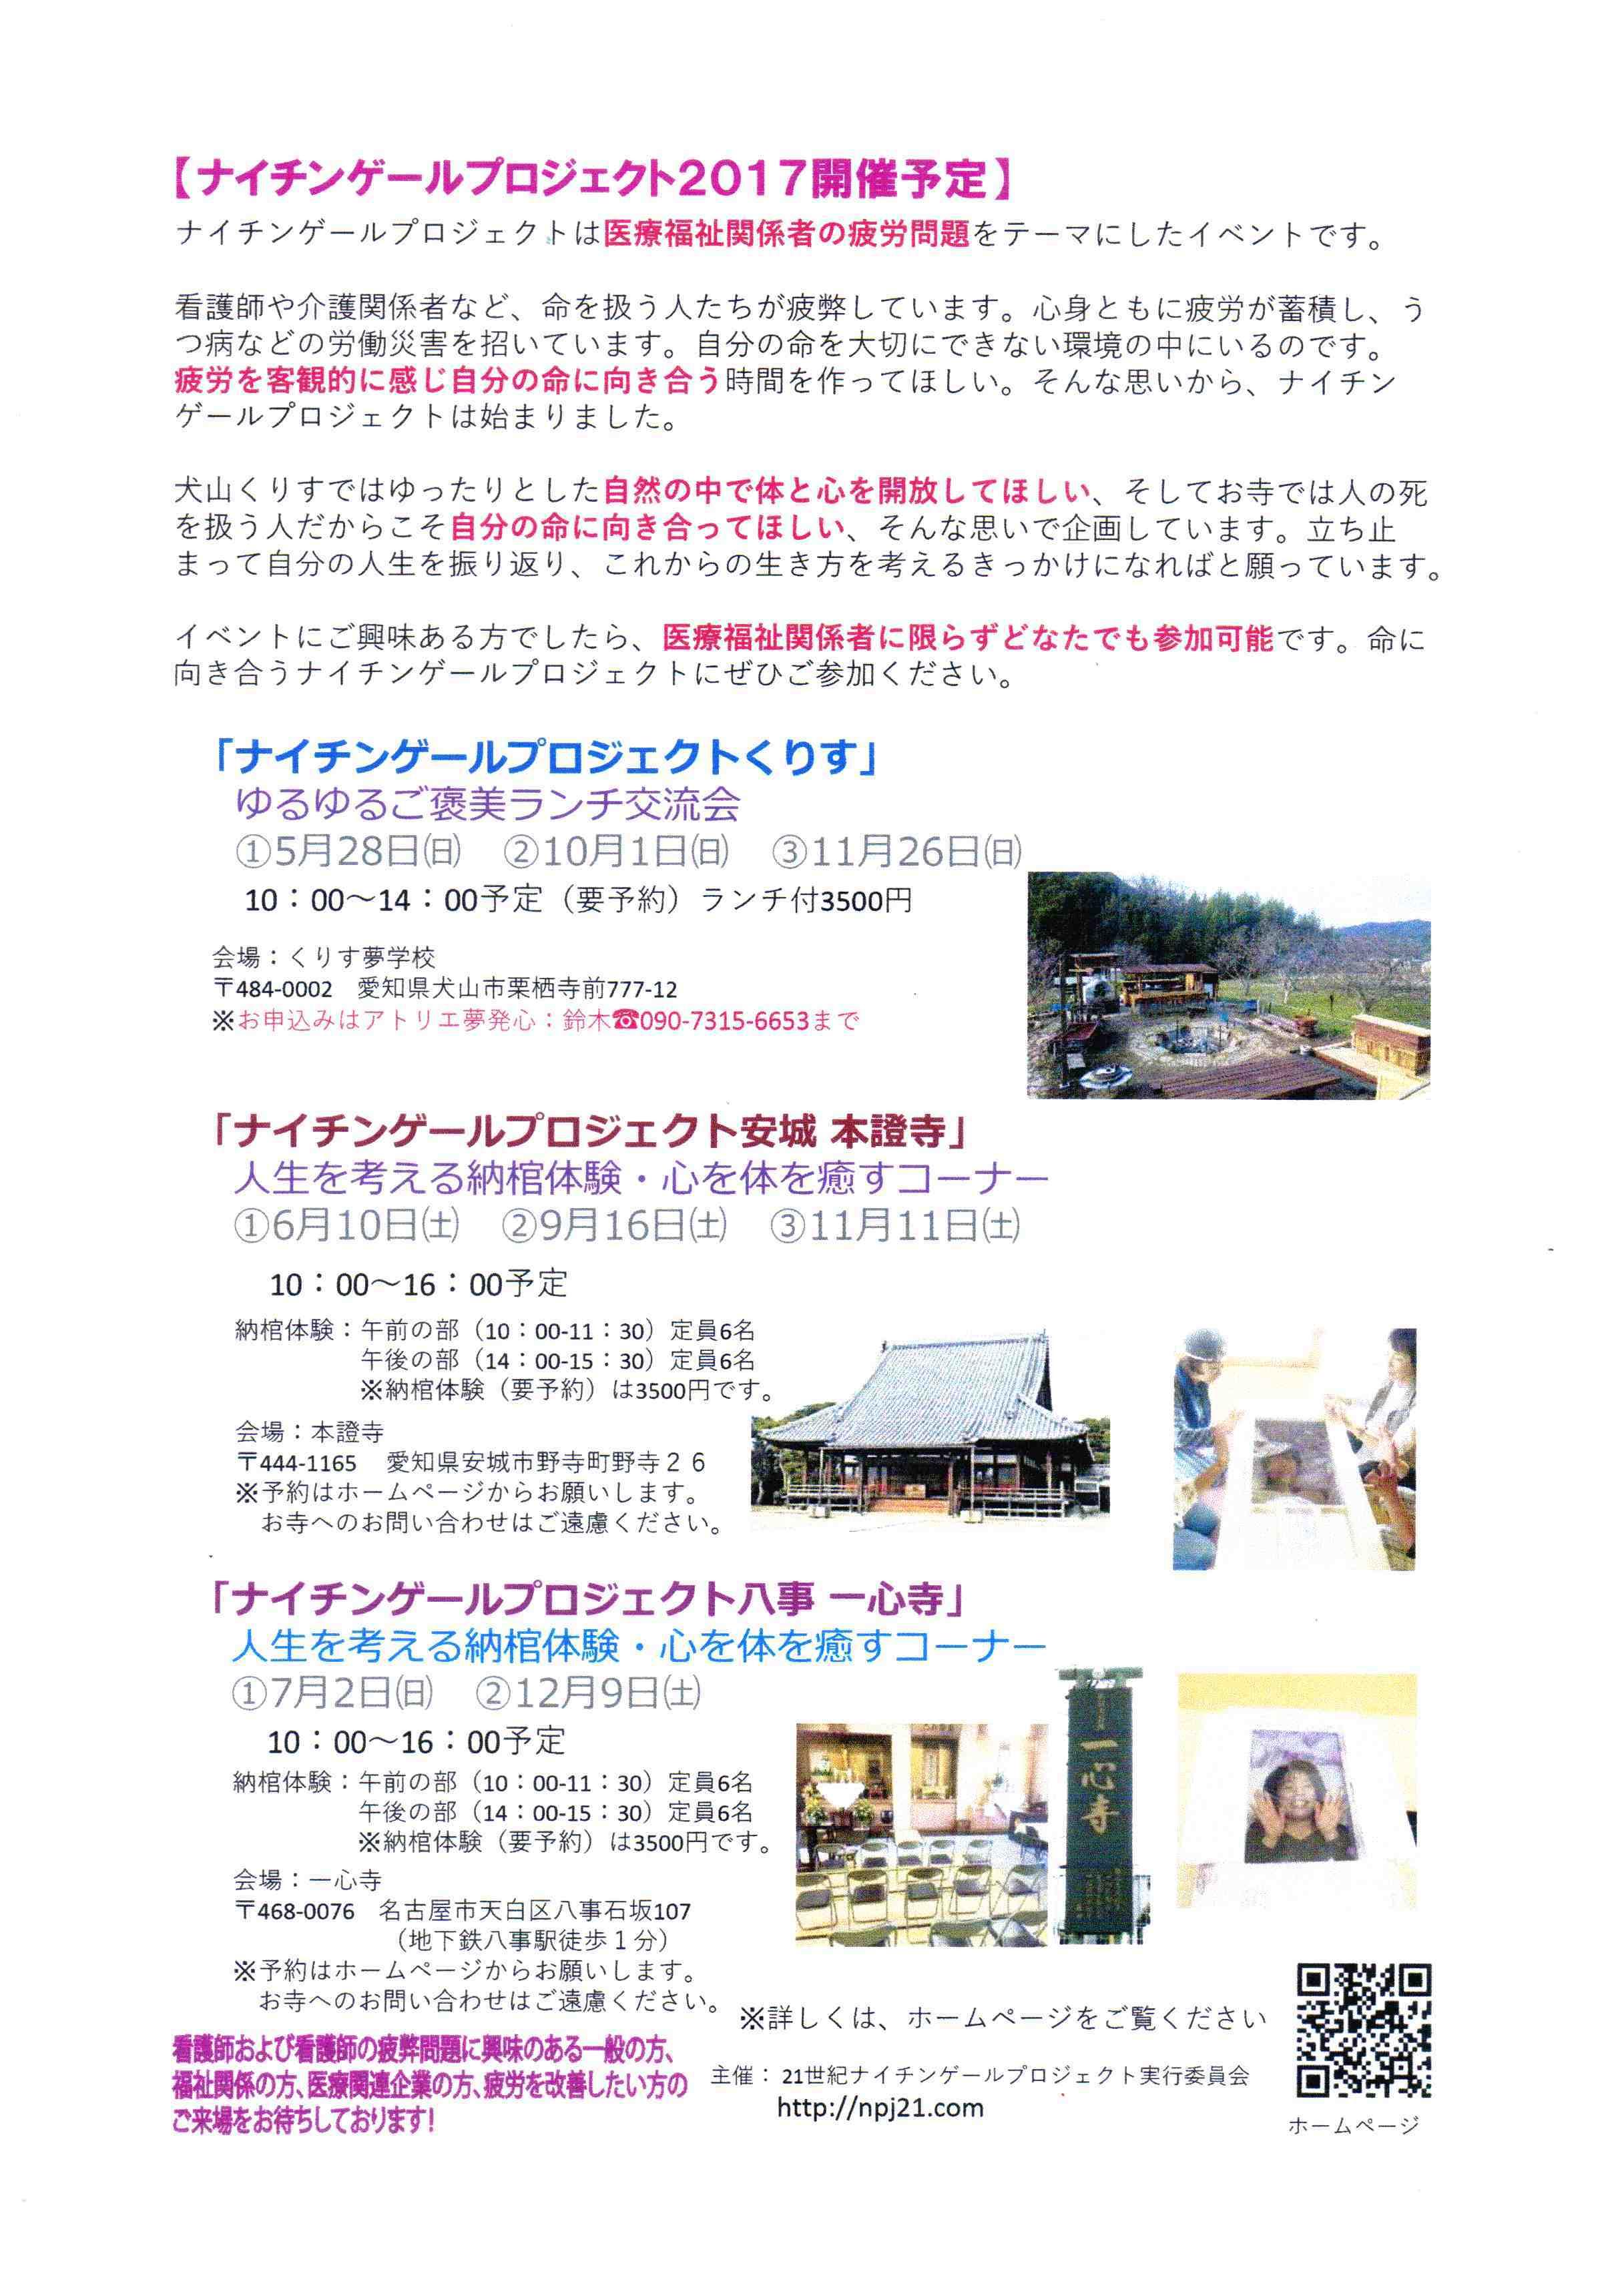 SCAN0024_2017052116412669d.jpg